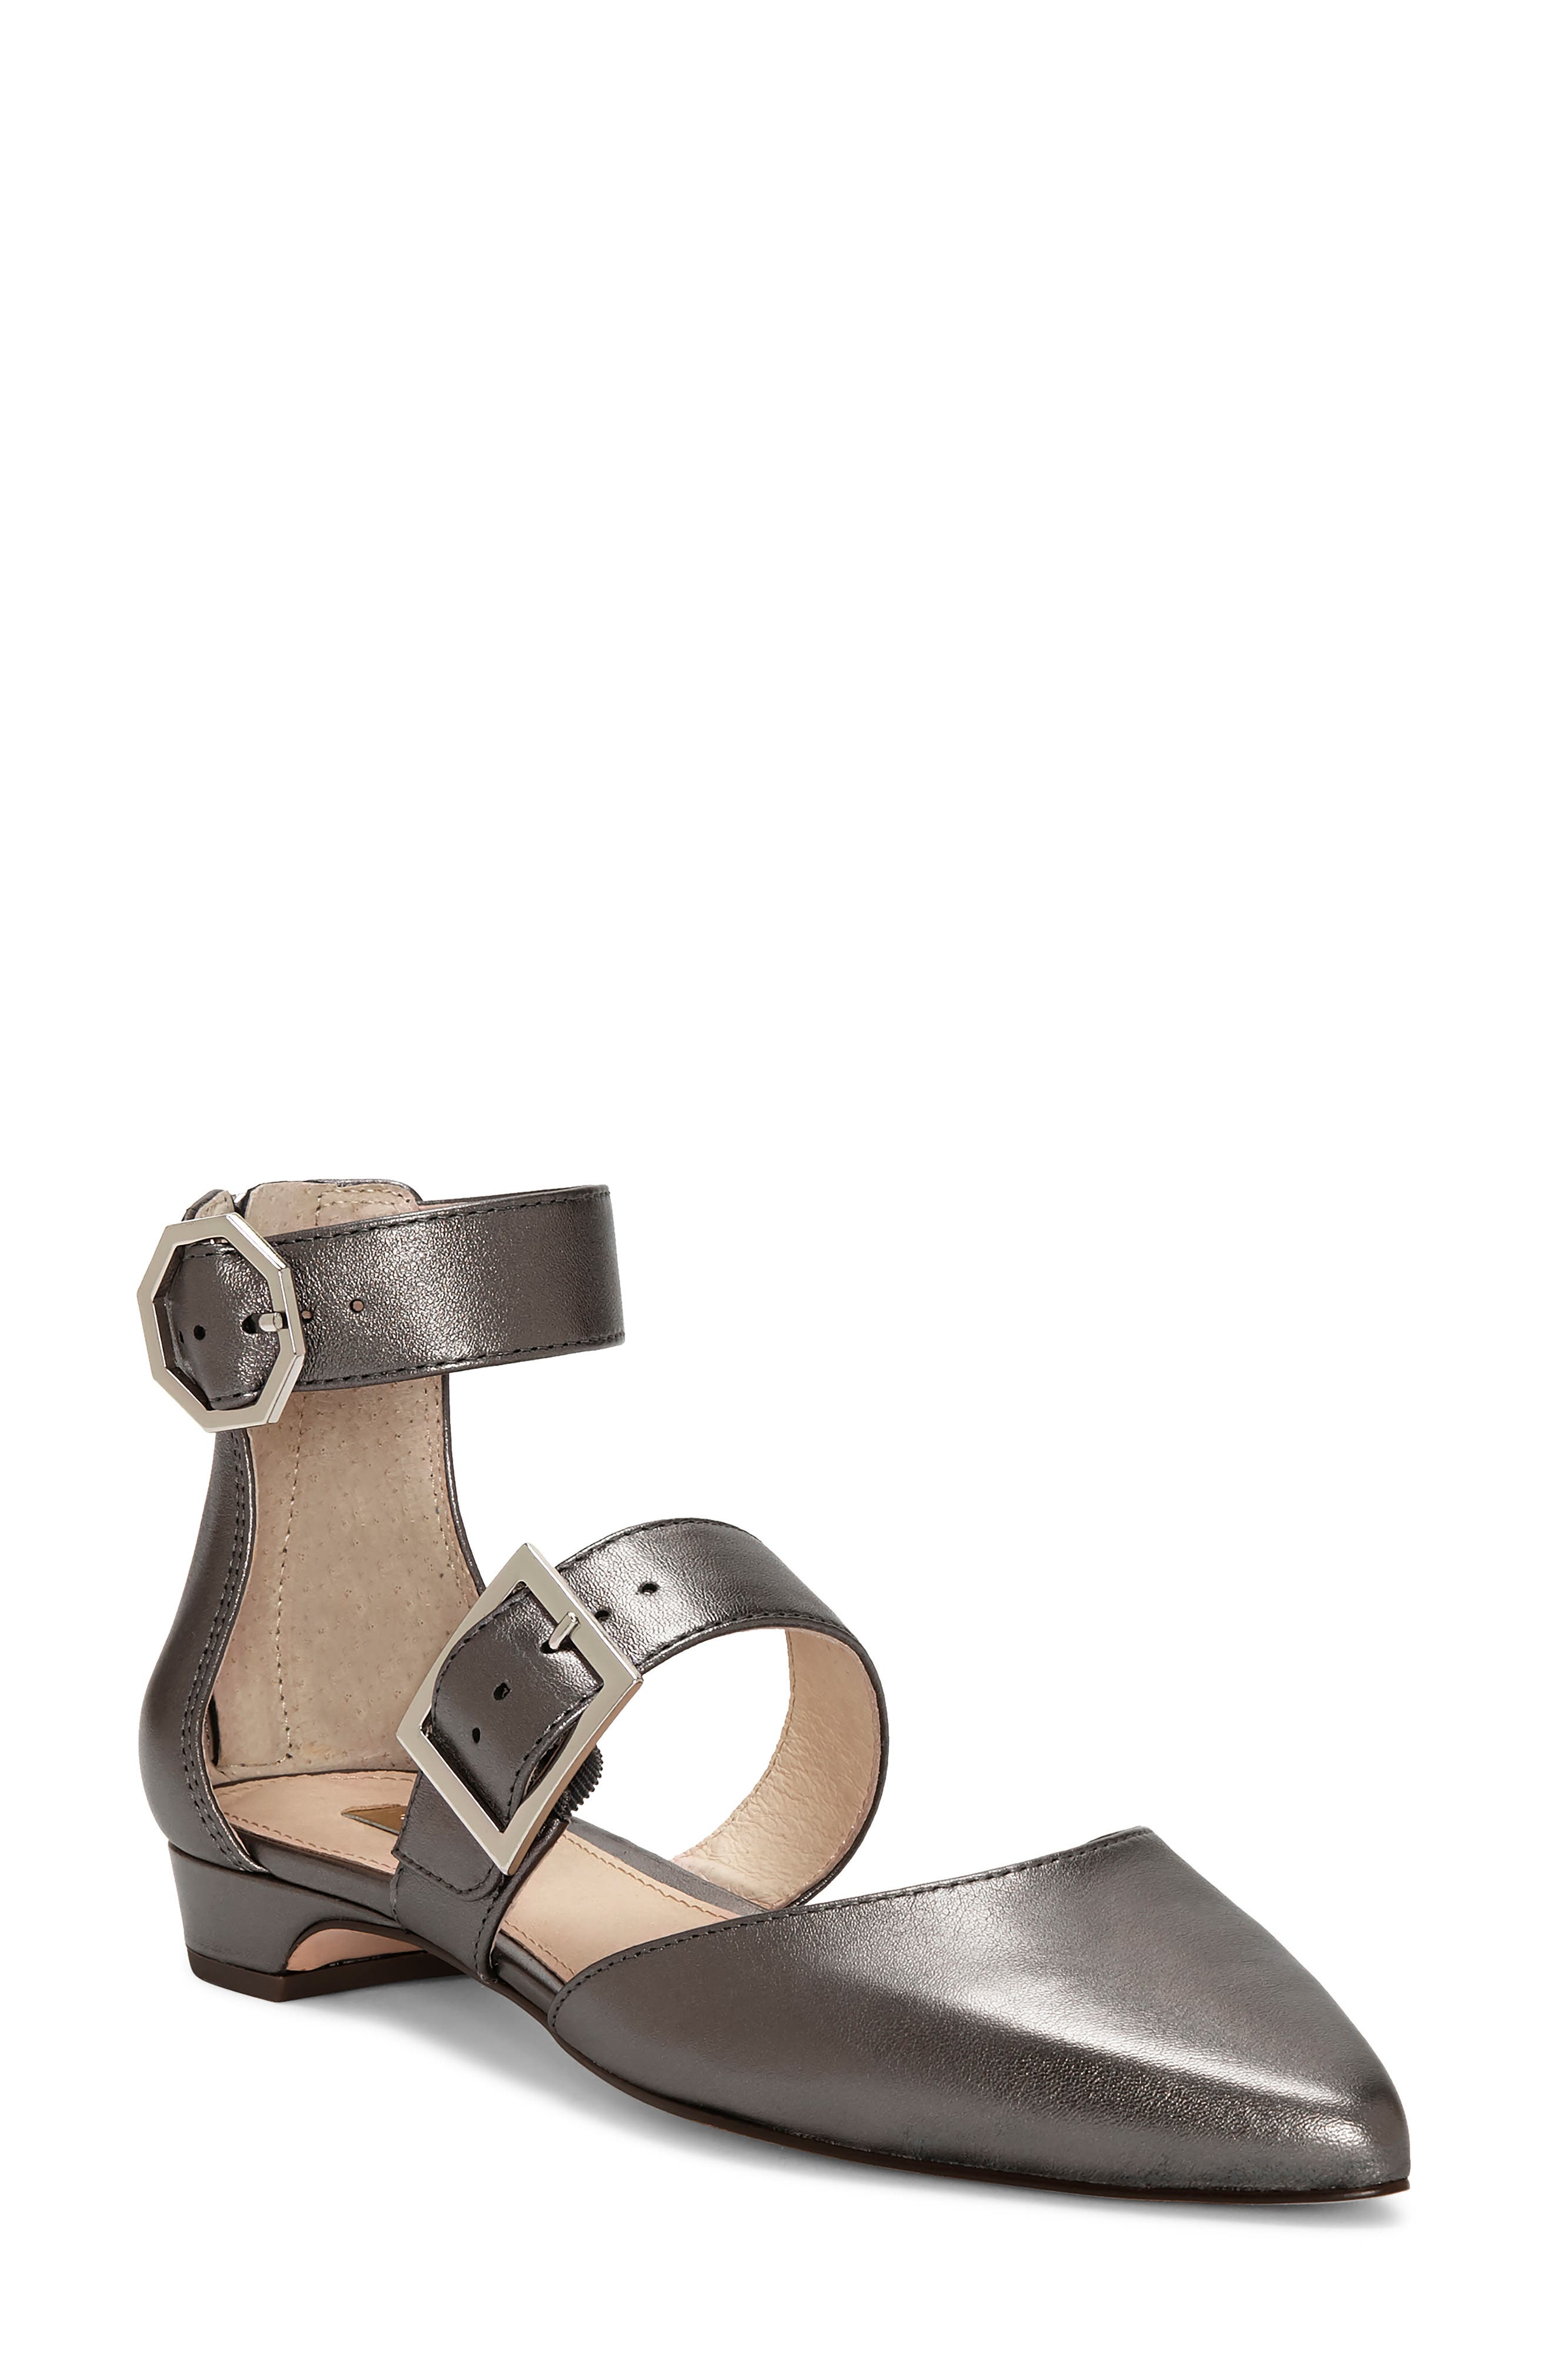 Louise Et Cie Corriett Ankle Strap Sandal, Metallic